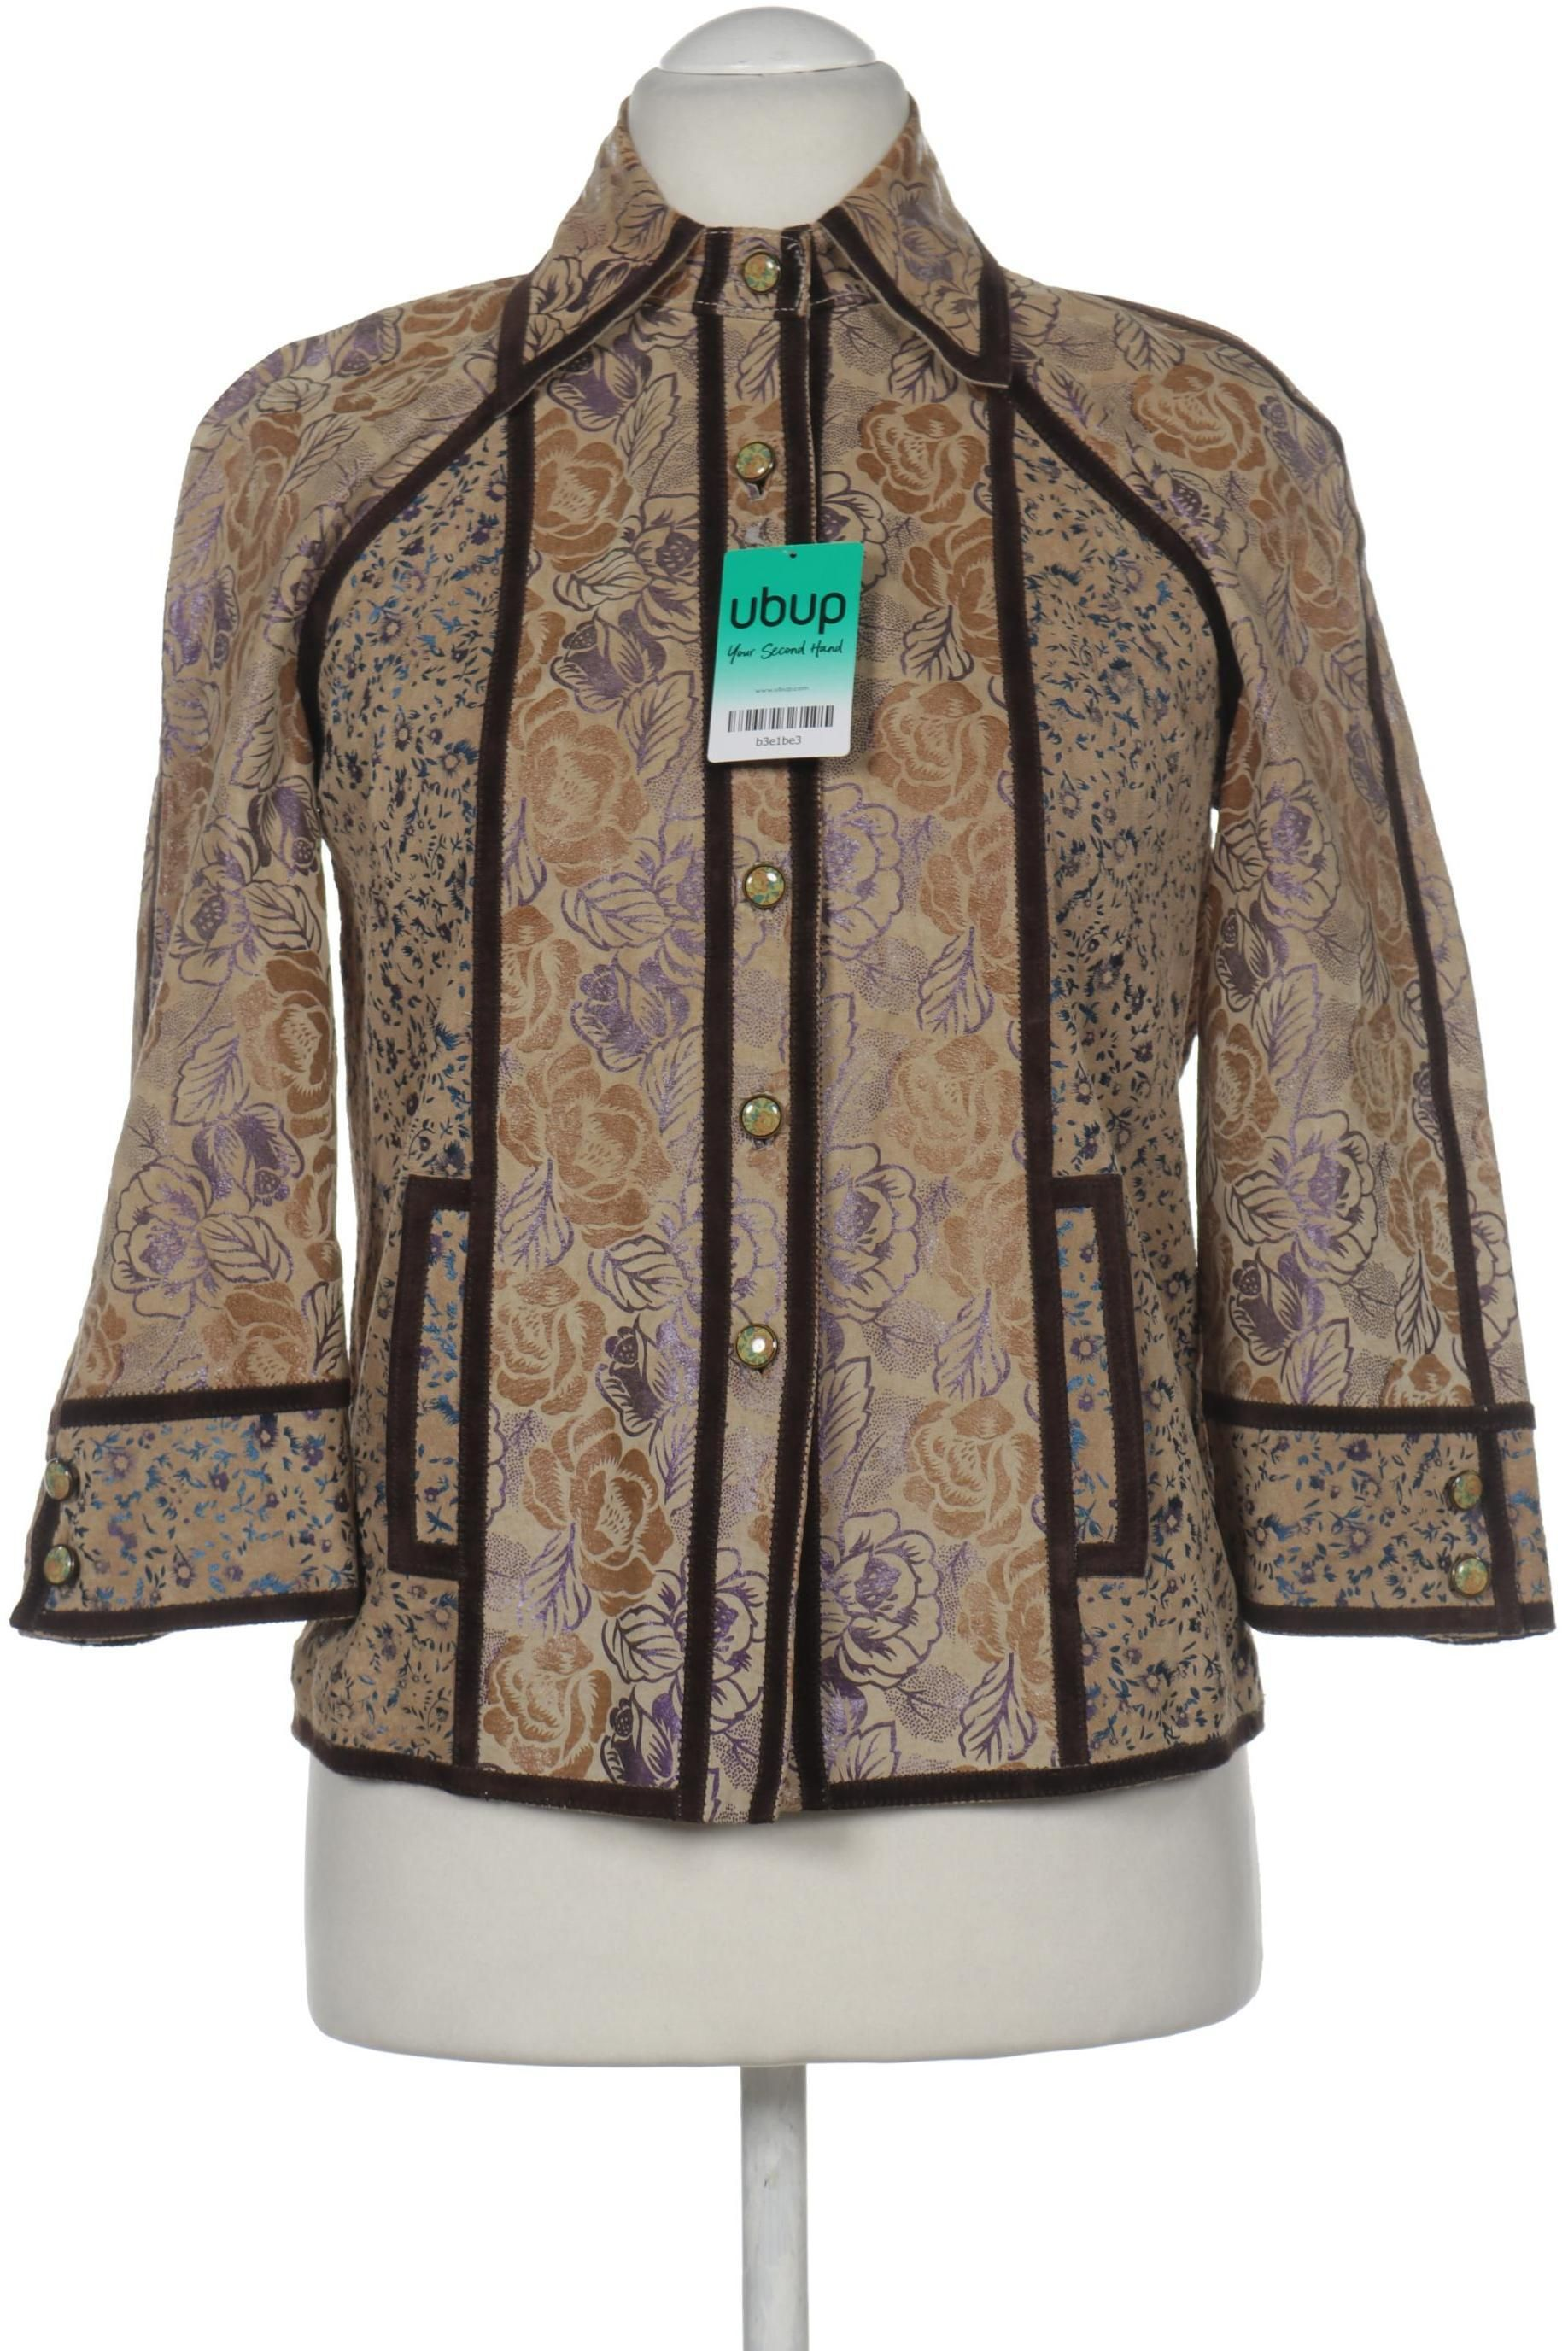 ubup   American Retro Damen Jacke DE 9 Second Hand kaufen ...